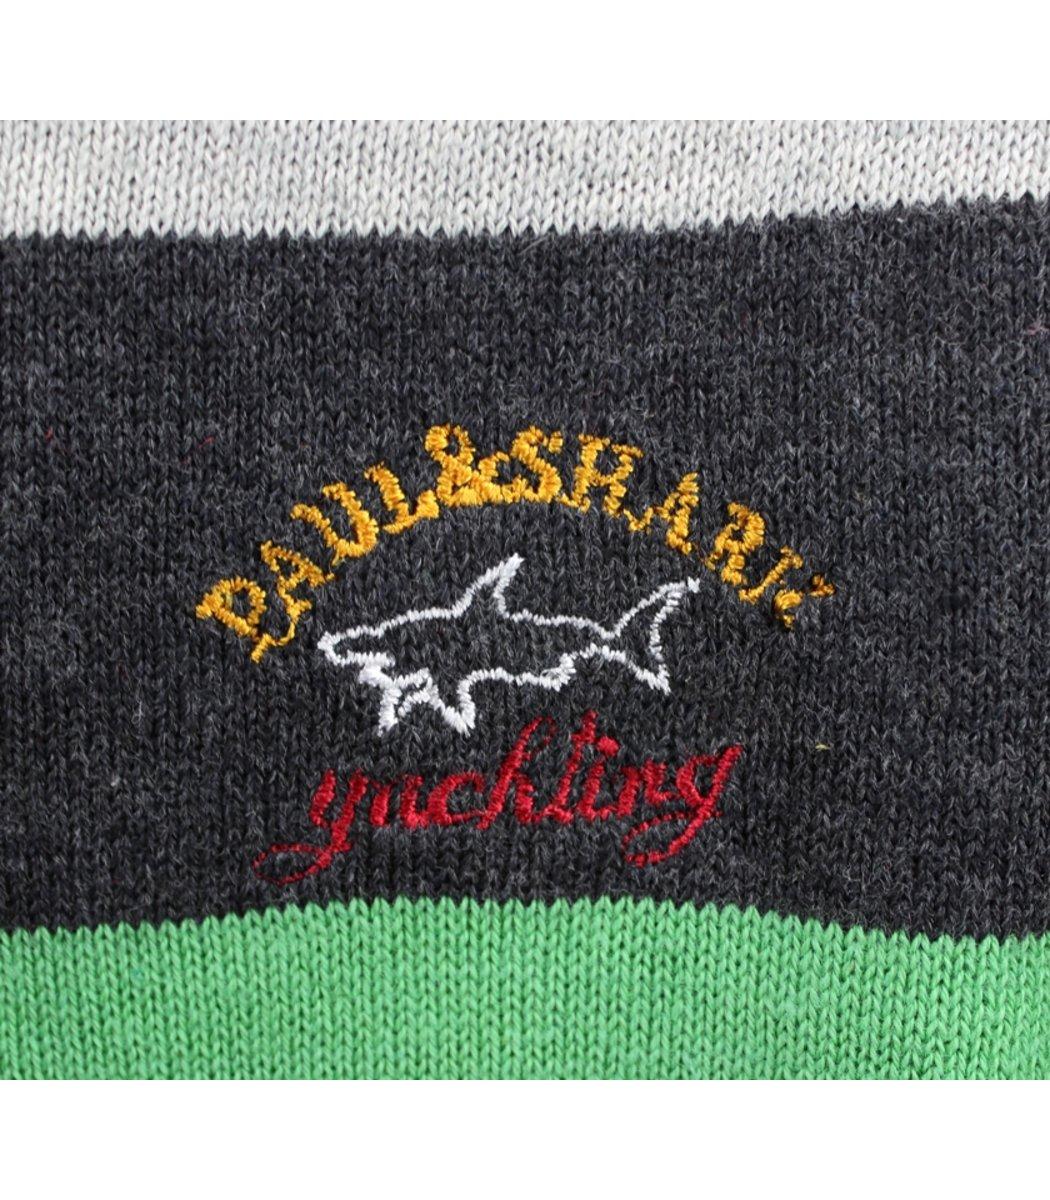 Джемпер в полоску Paul&Shark JP1 (Серый/белый)